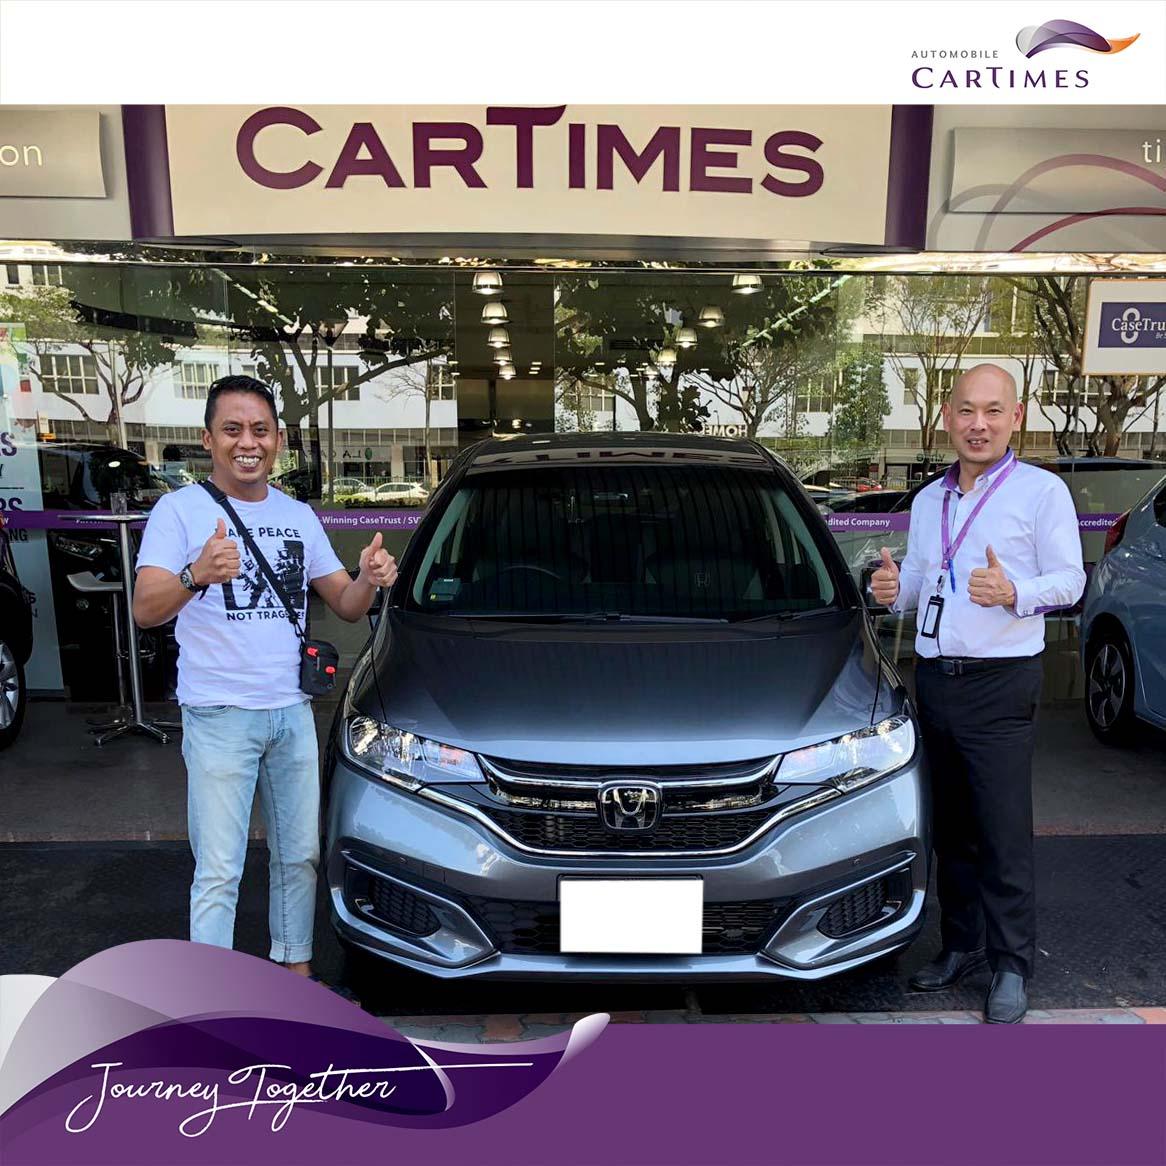 CS Tan CArtimes Used/New Car Review